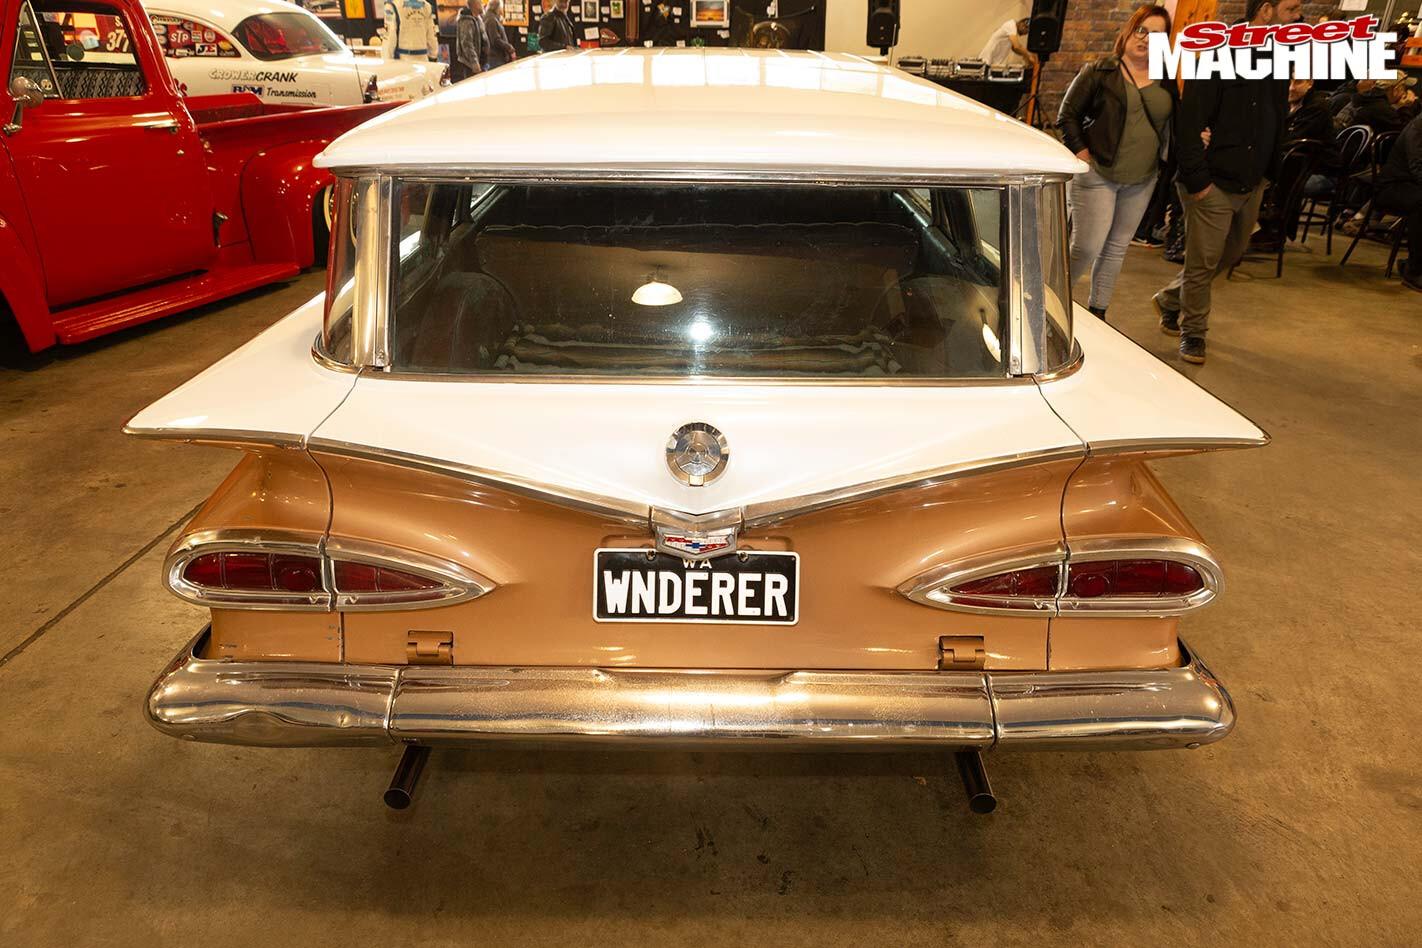 1959 Chevy wagon